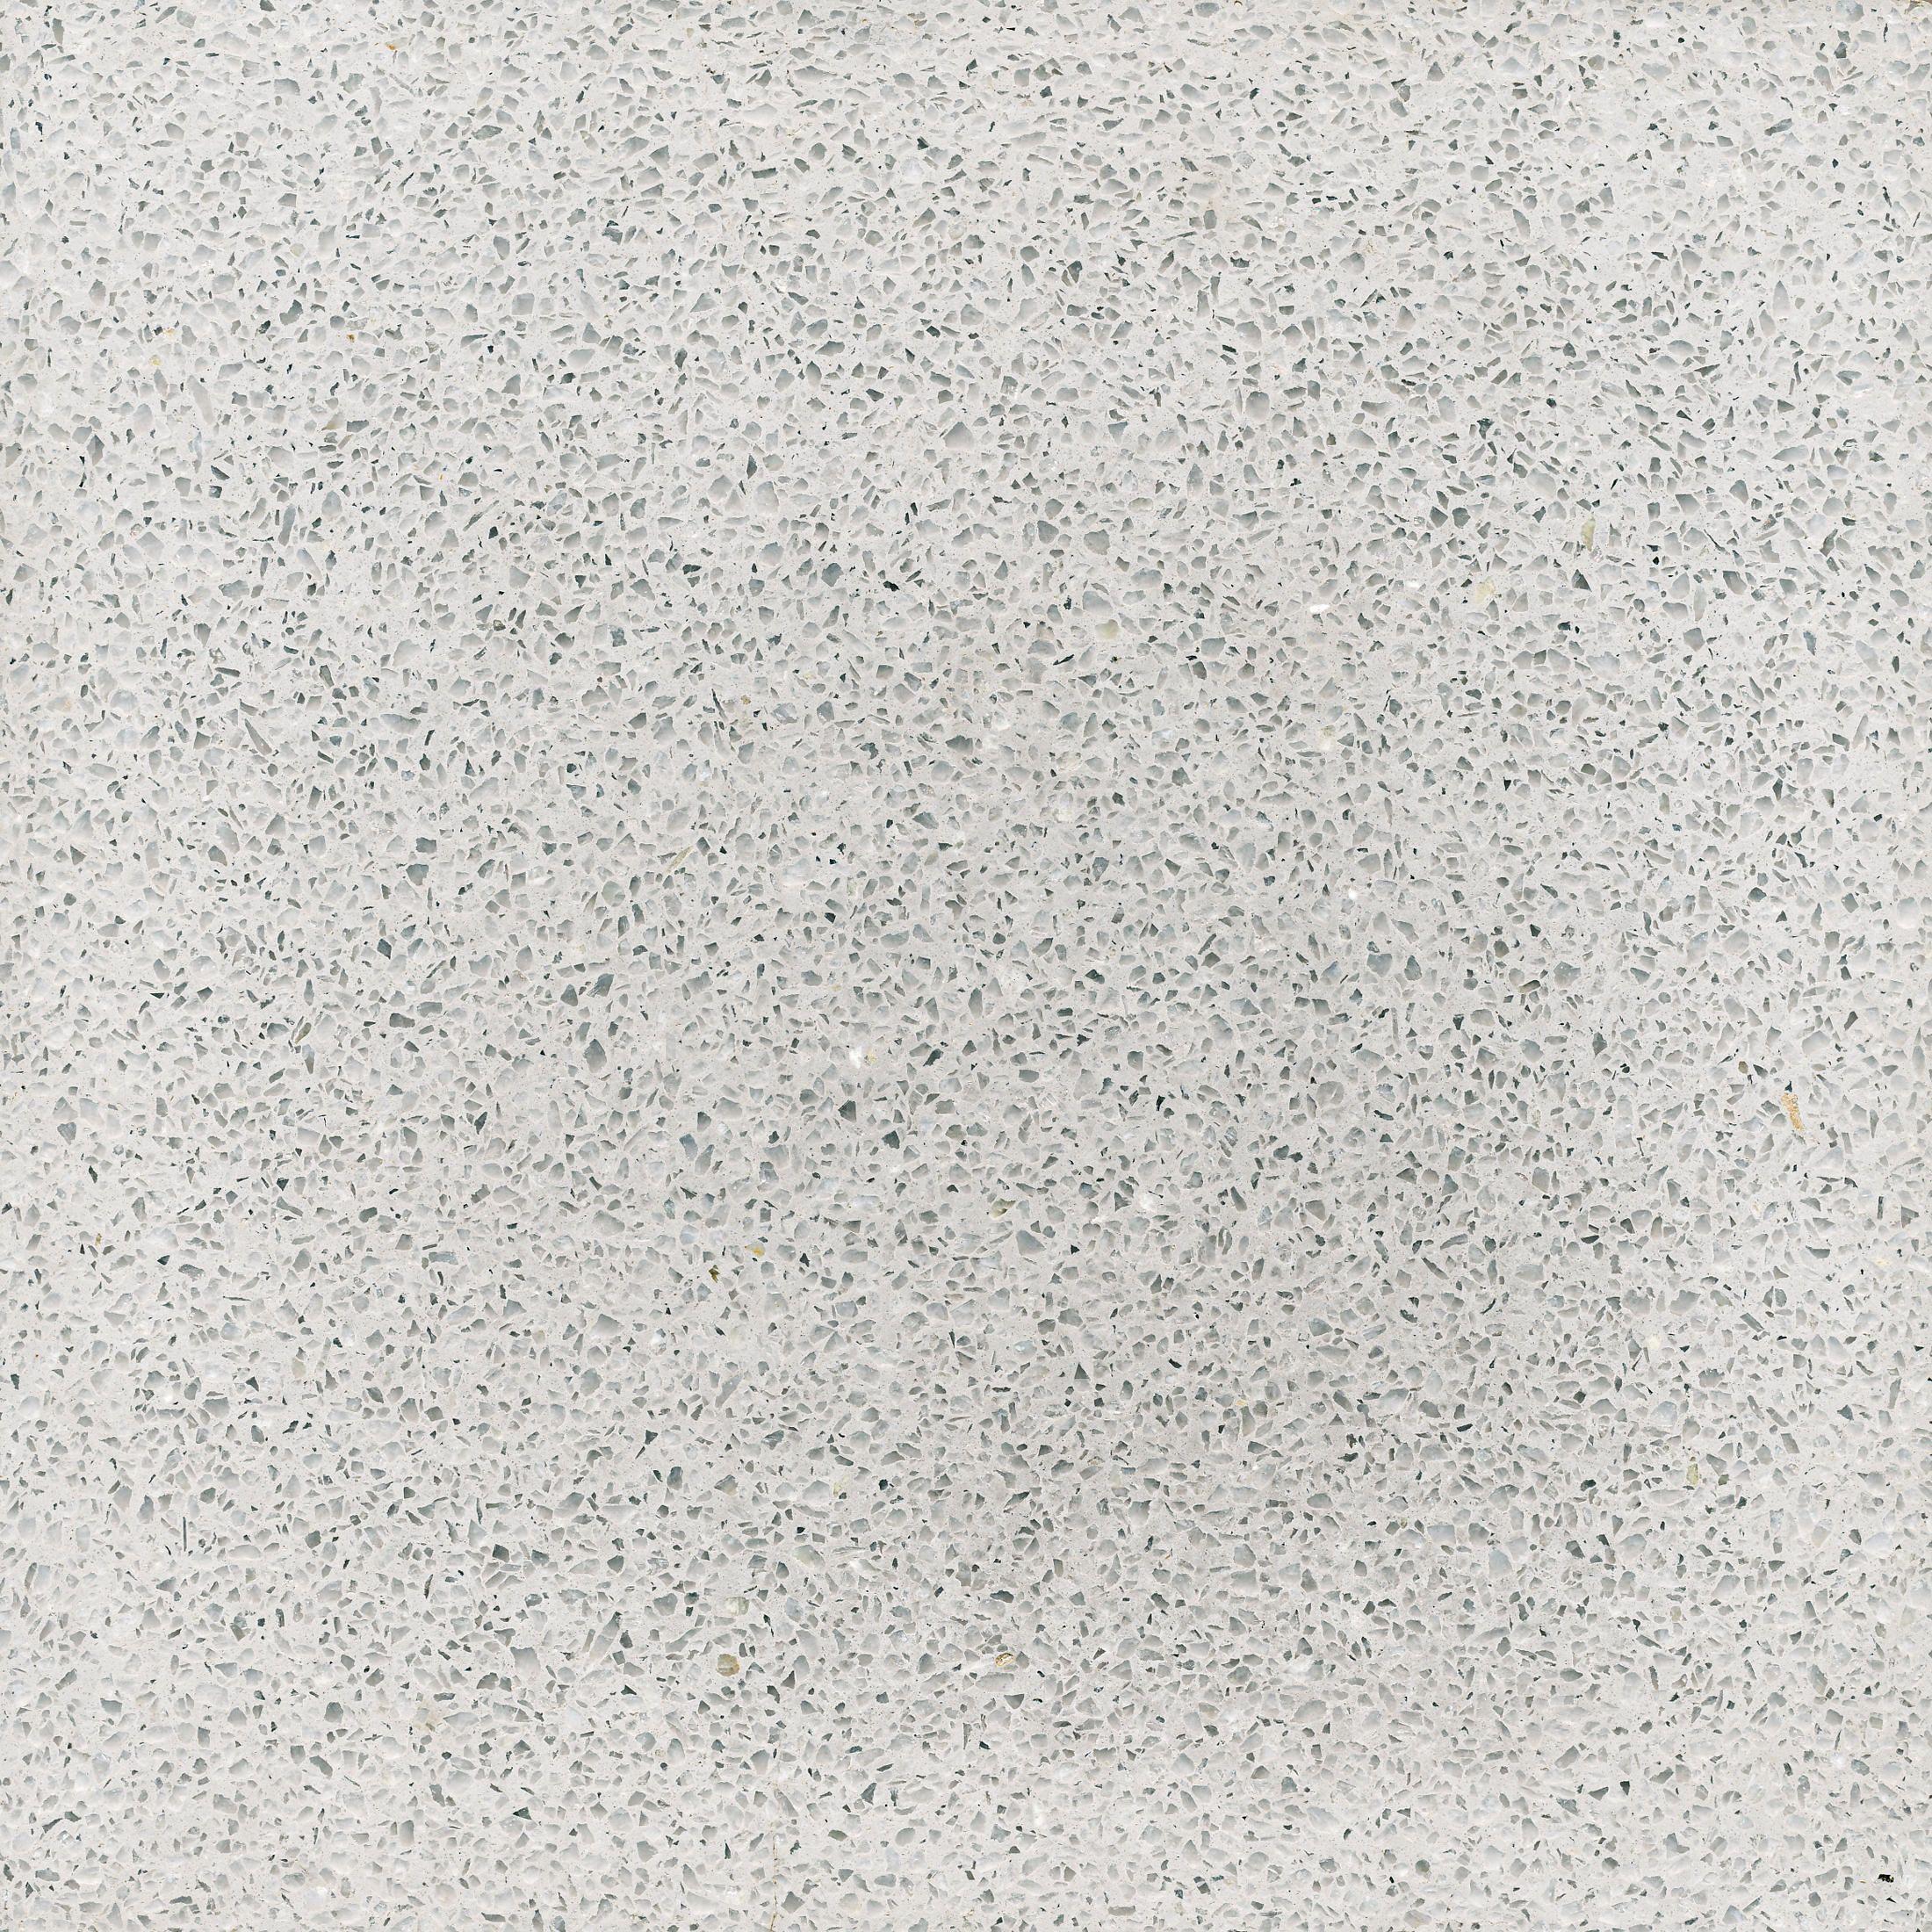 Uni Terrazzo Tile By Via